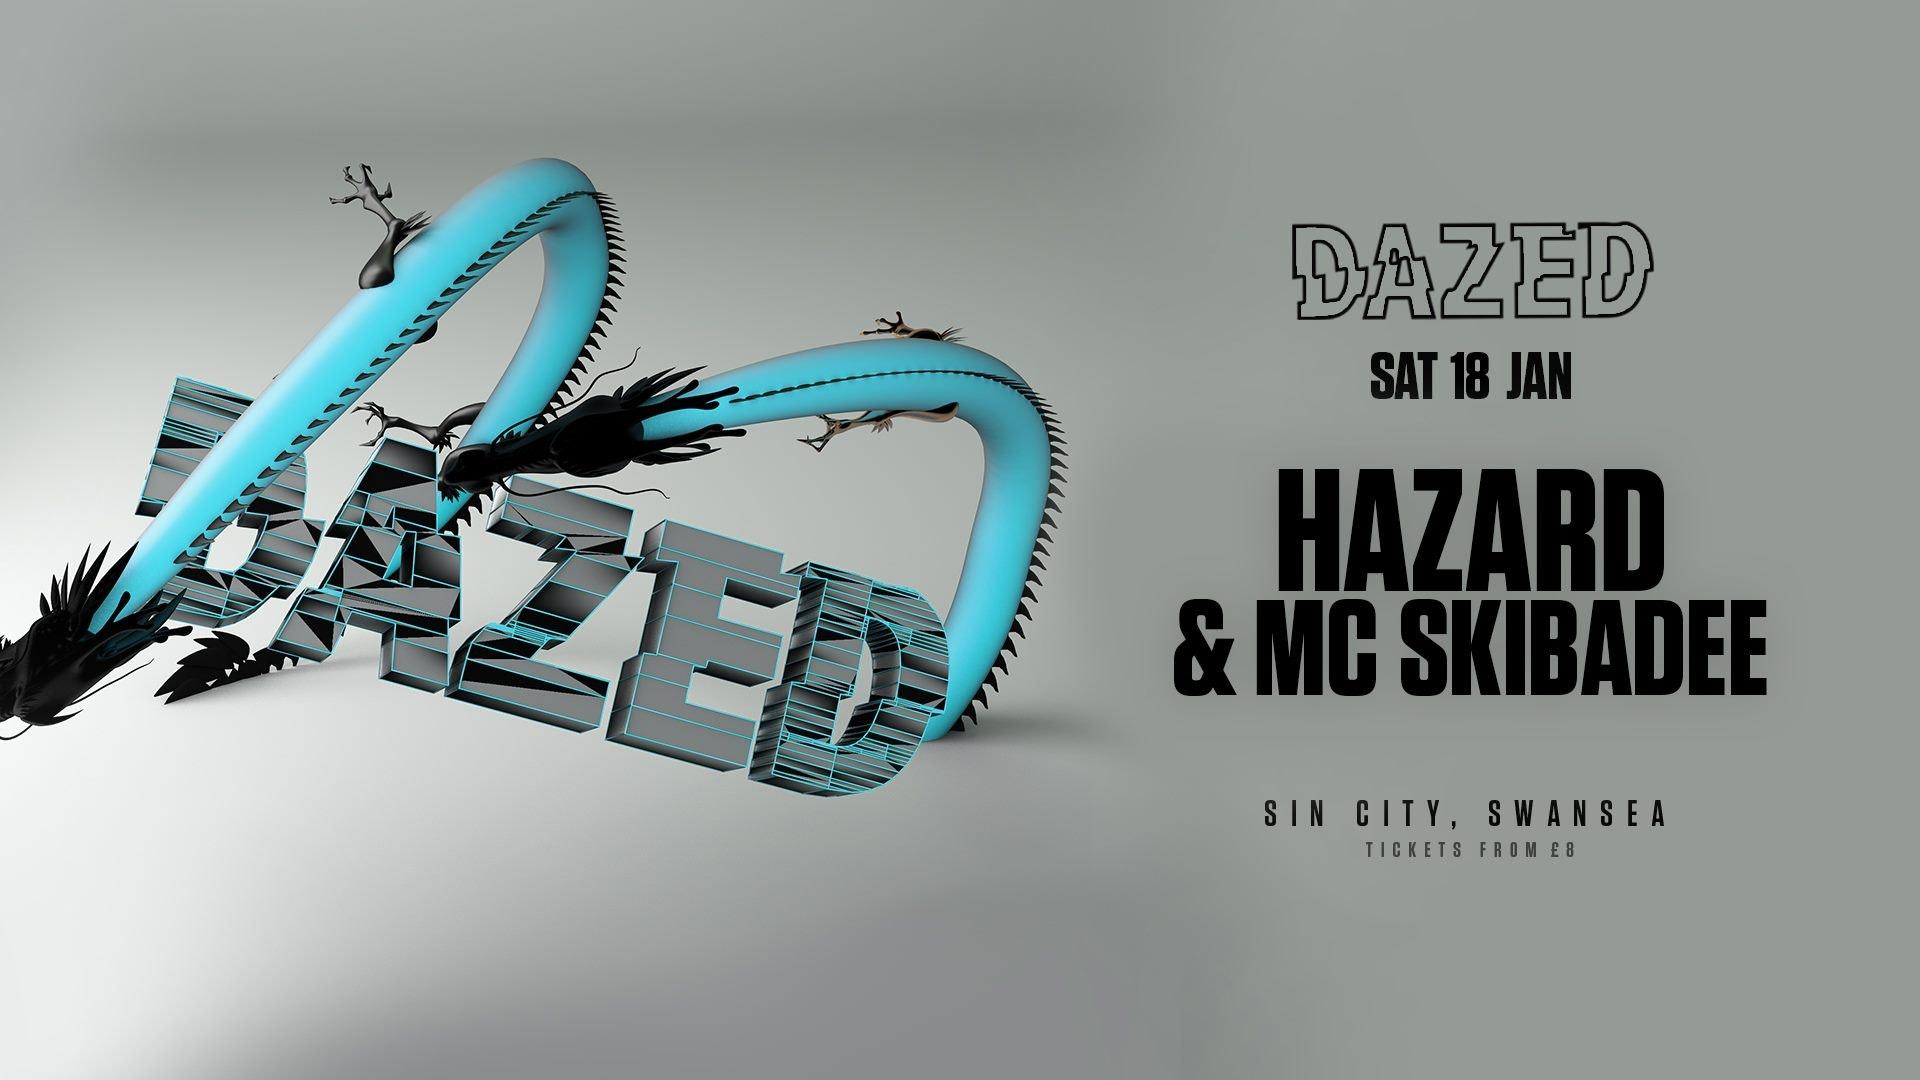 Dazed Pres: DJ Hazard & MC Skibadee